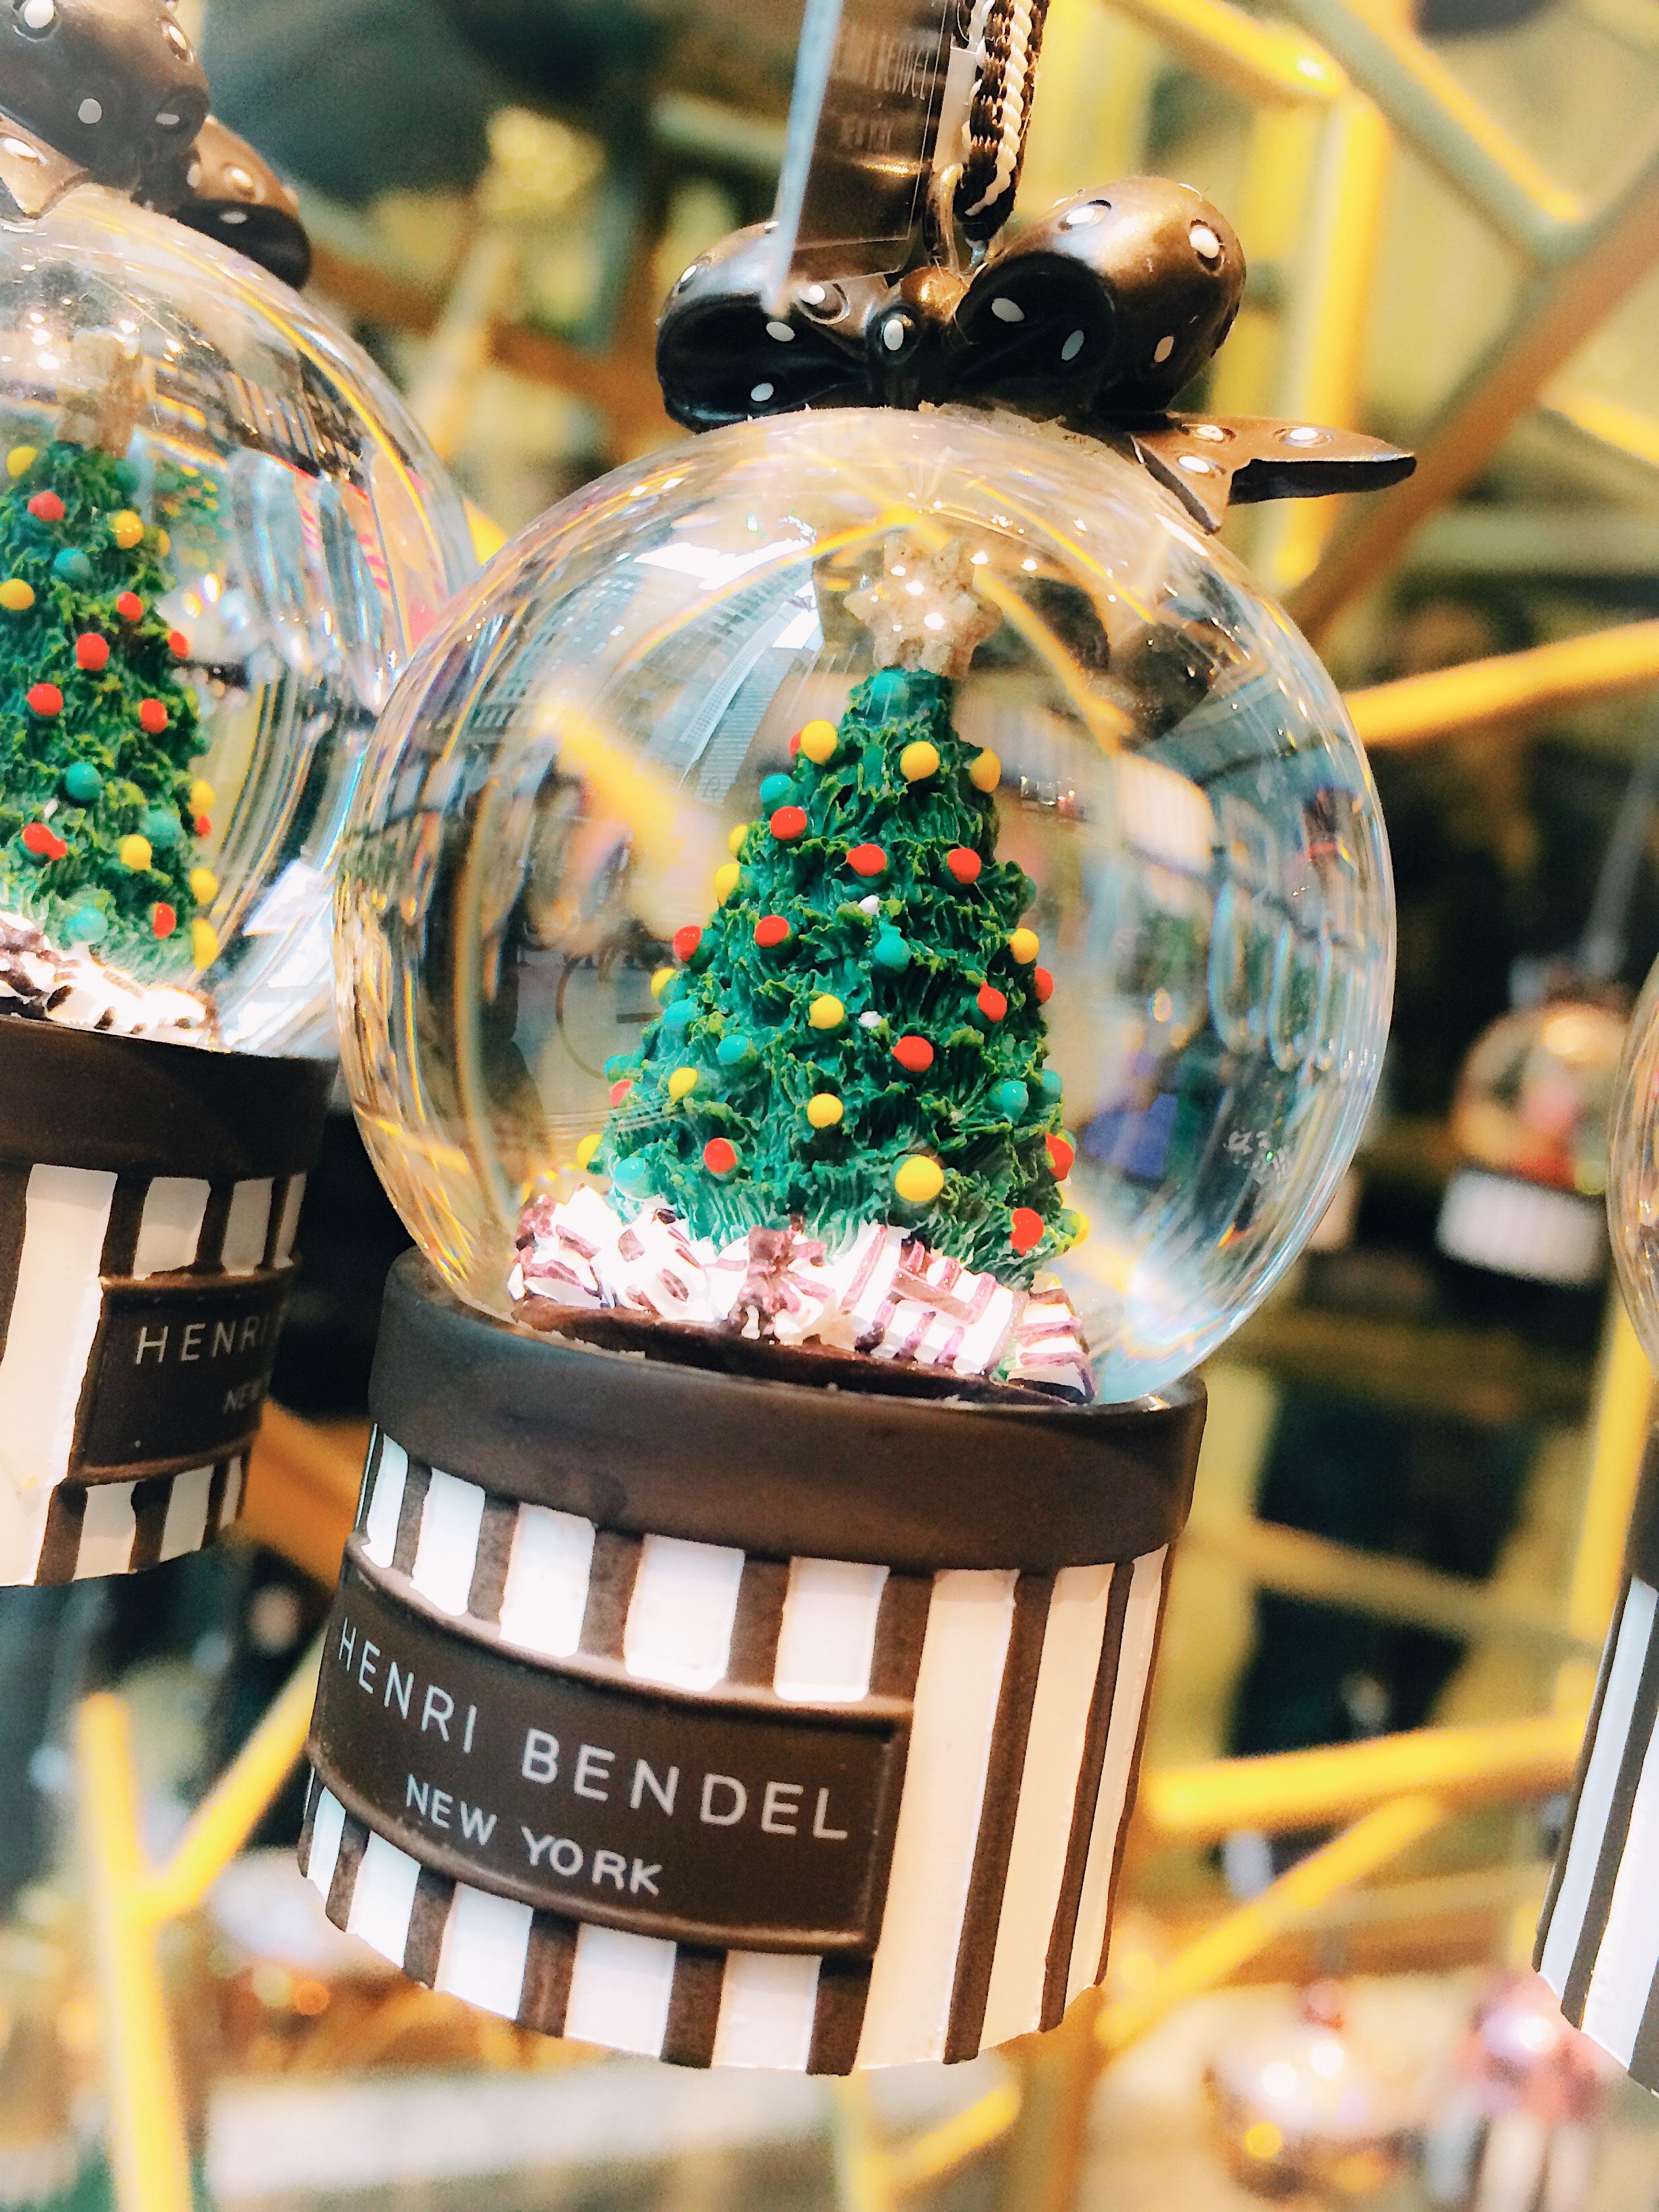 68d6278f 32a6 483d a9ac 398cdfa98904 - Christmas in New York - ホリデーシーズンのニューヨーク 街に溢れるクリスマスイルミネーション